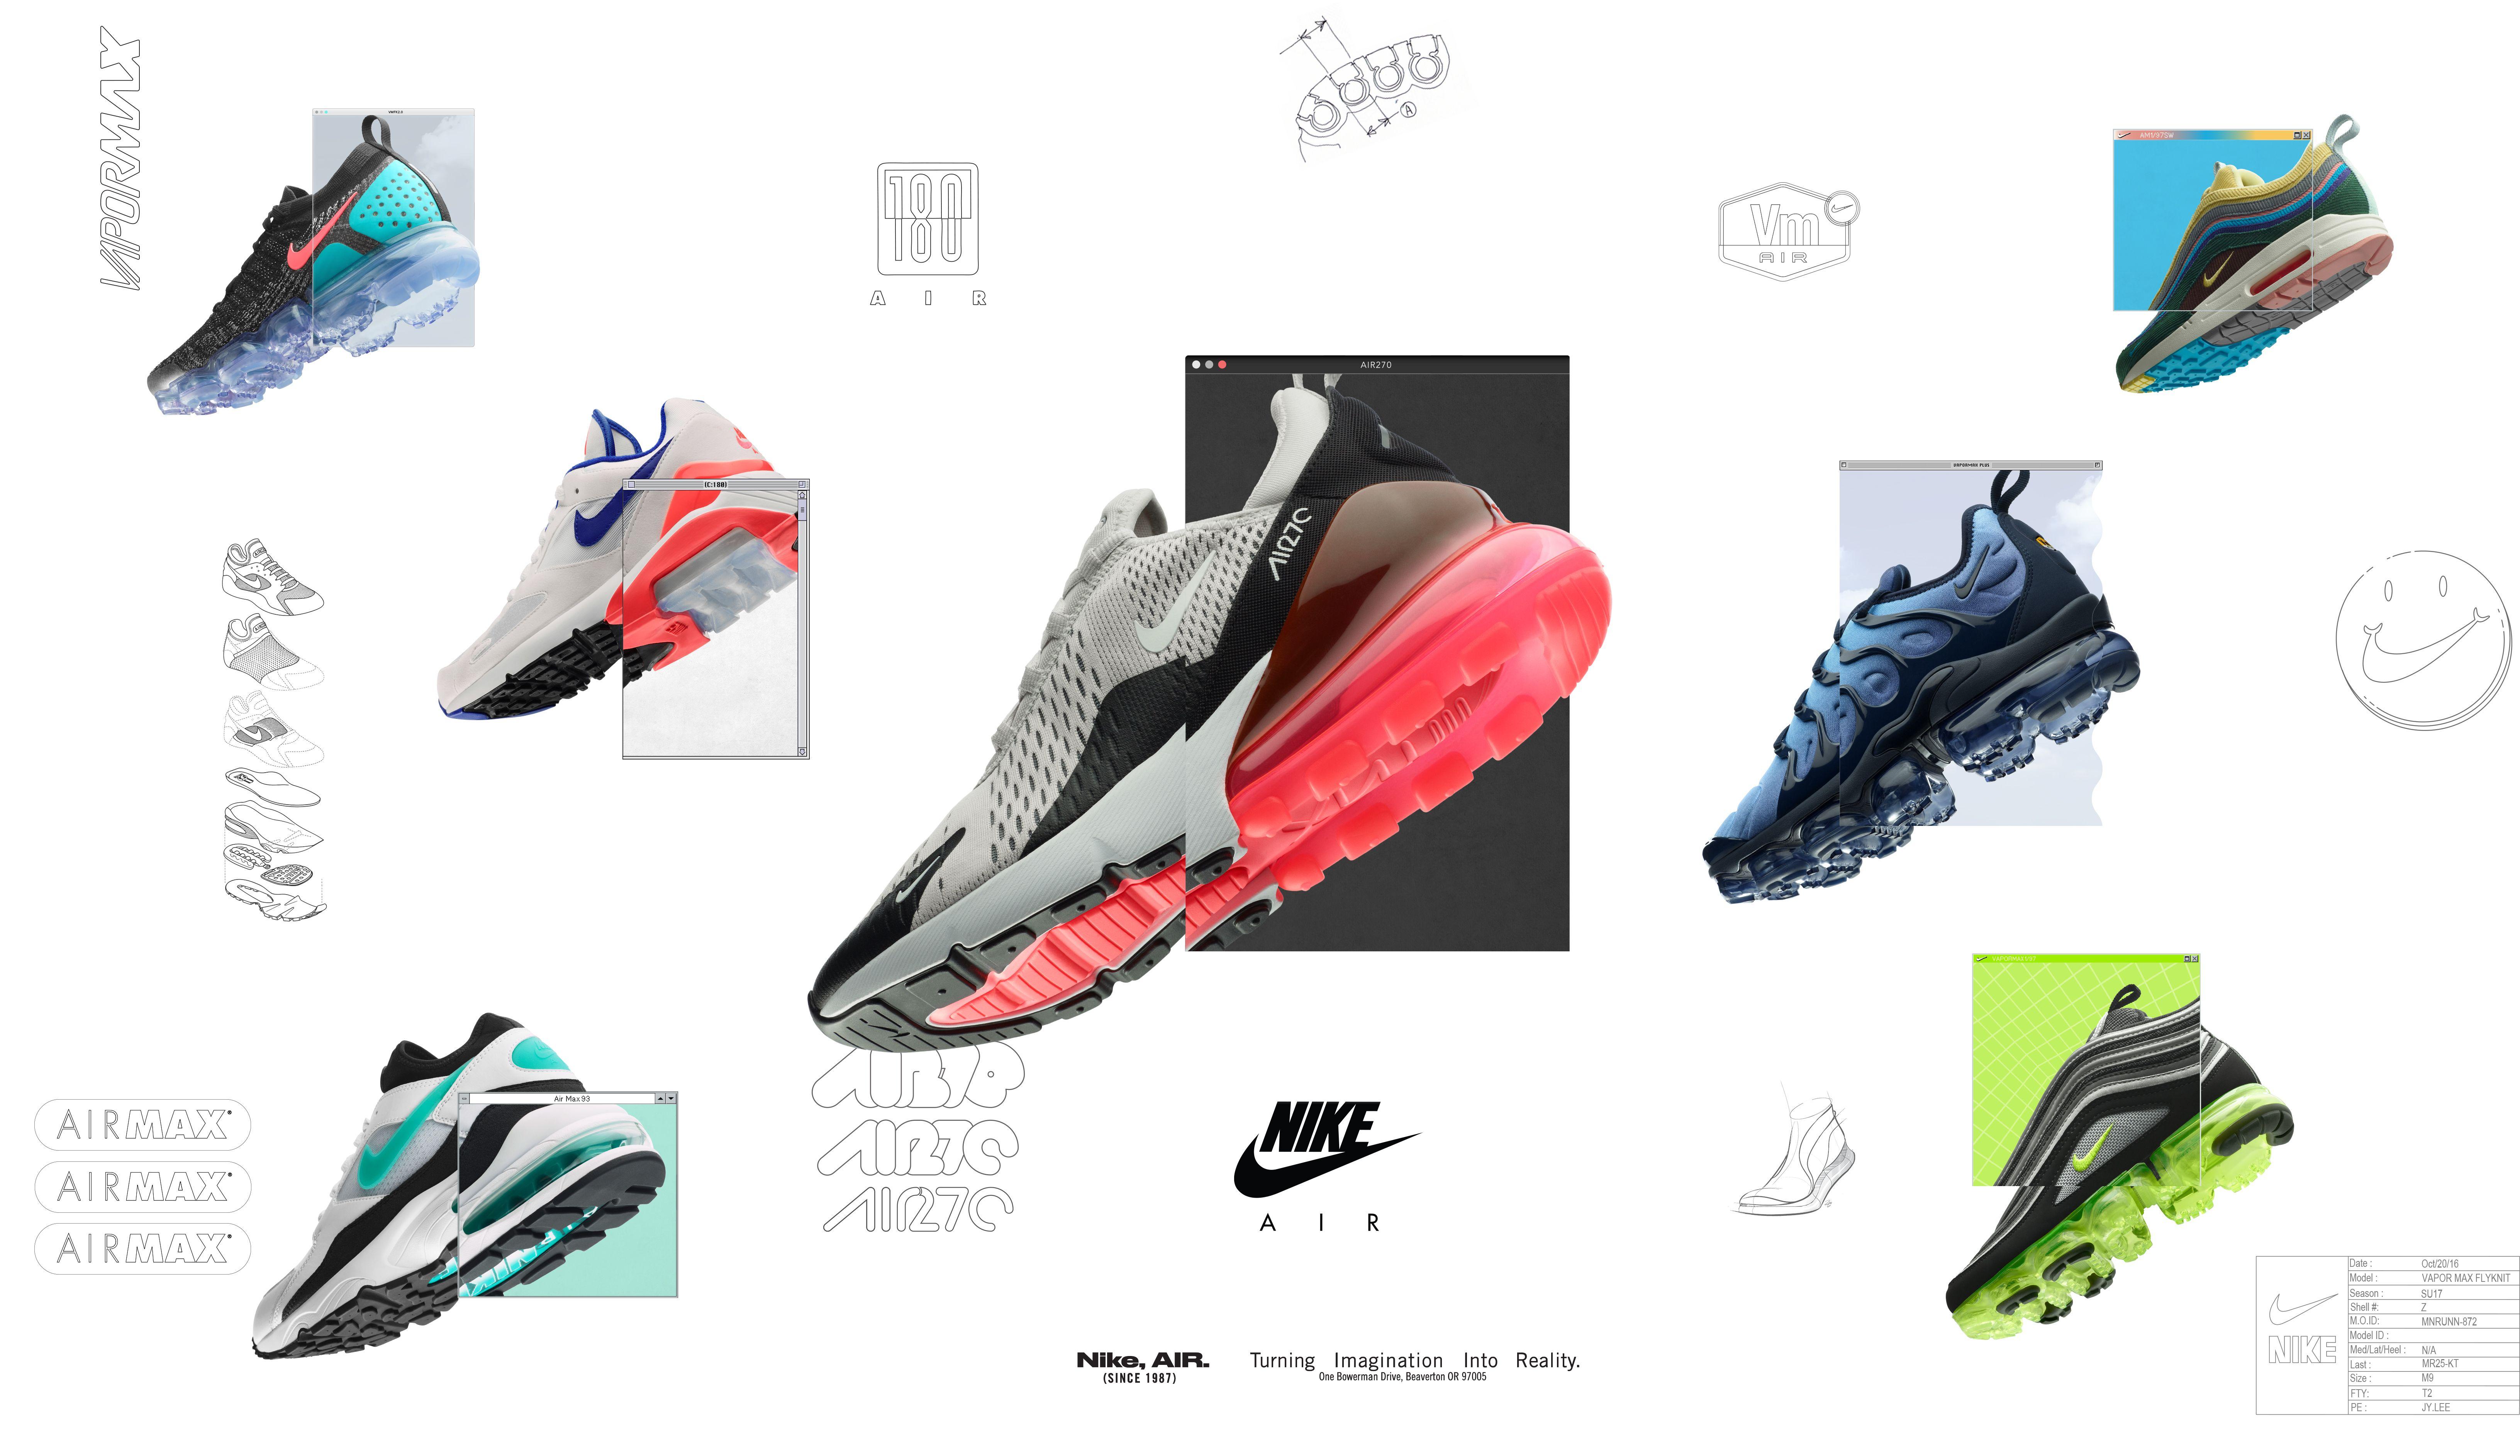 b5778285342 Nike Air Max Day 2018